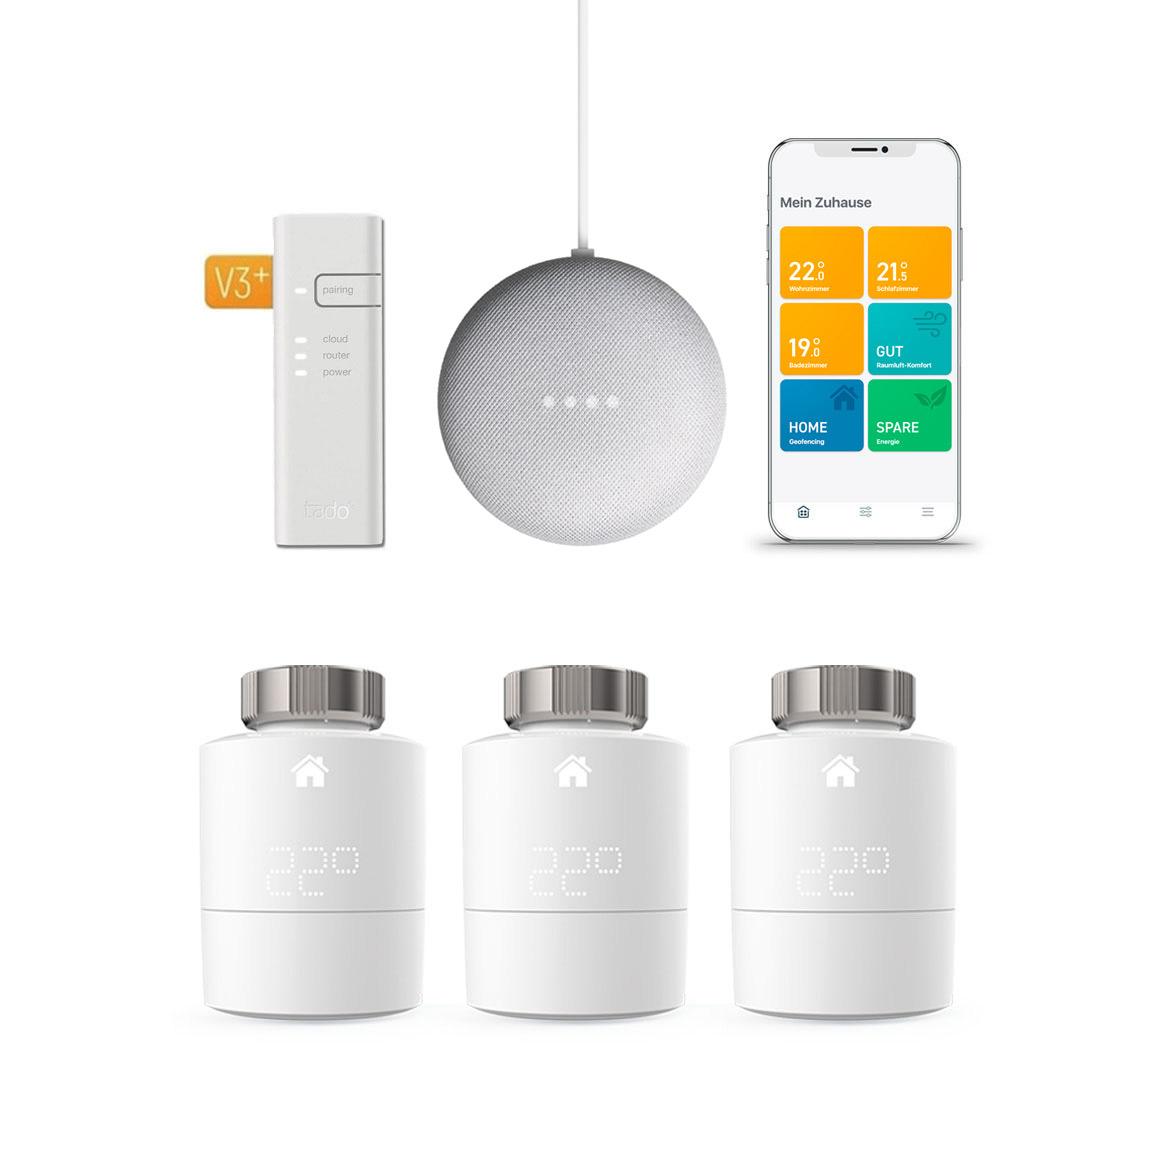 tado° Smartes Heizkörper-Thermostat Starter Kit V3+ mit 3 Thermostaten & Bridge + Google Nest Mini